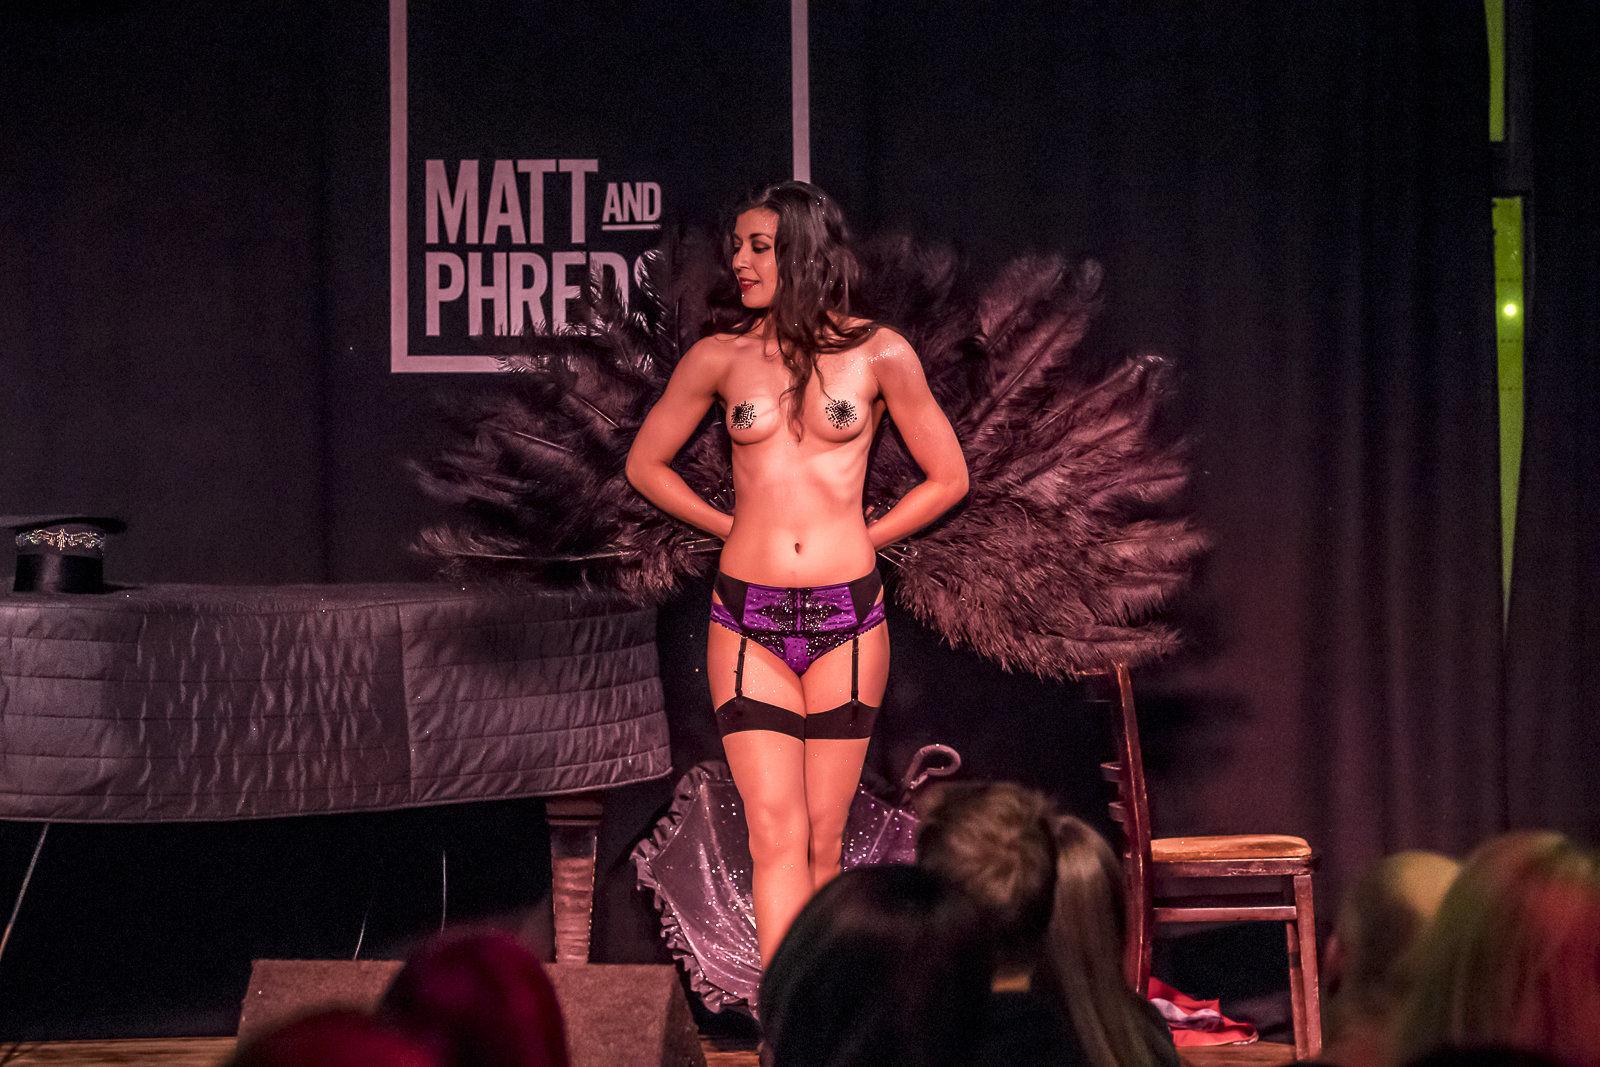 Cherie Bebe at Matt and Phreds, Manchester